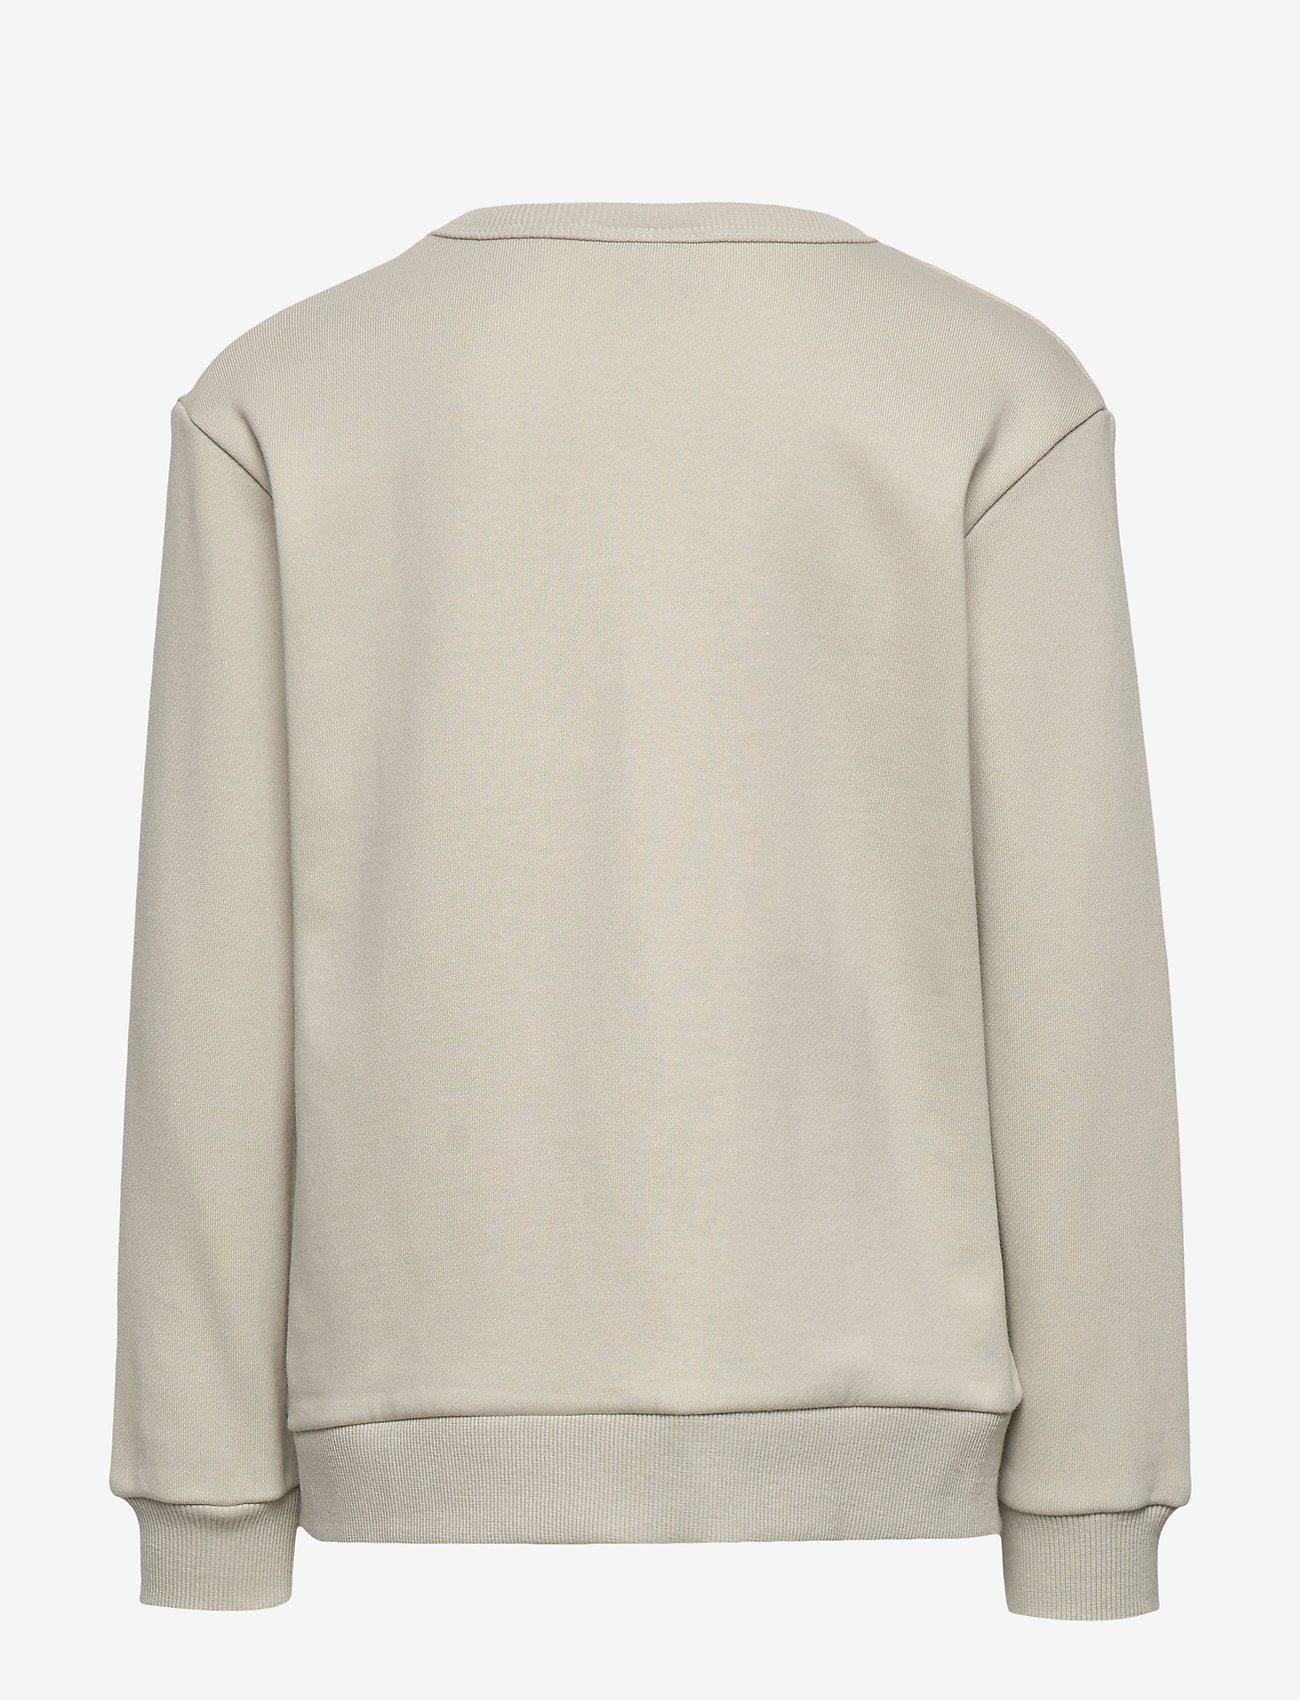 Petit by Sofie Schnoor - Sweat - sweatshirts - mint - 1